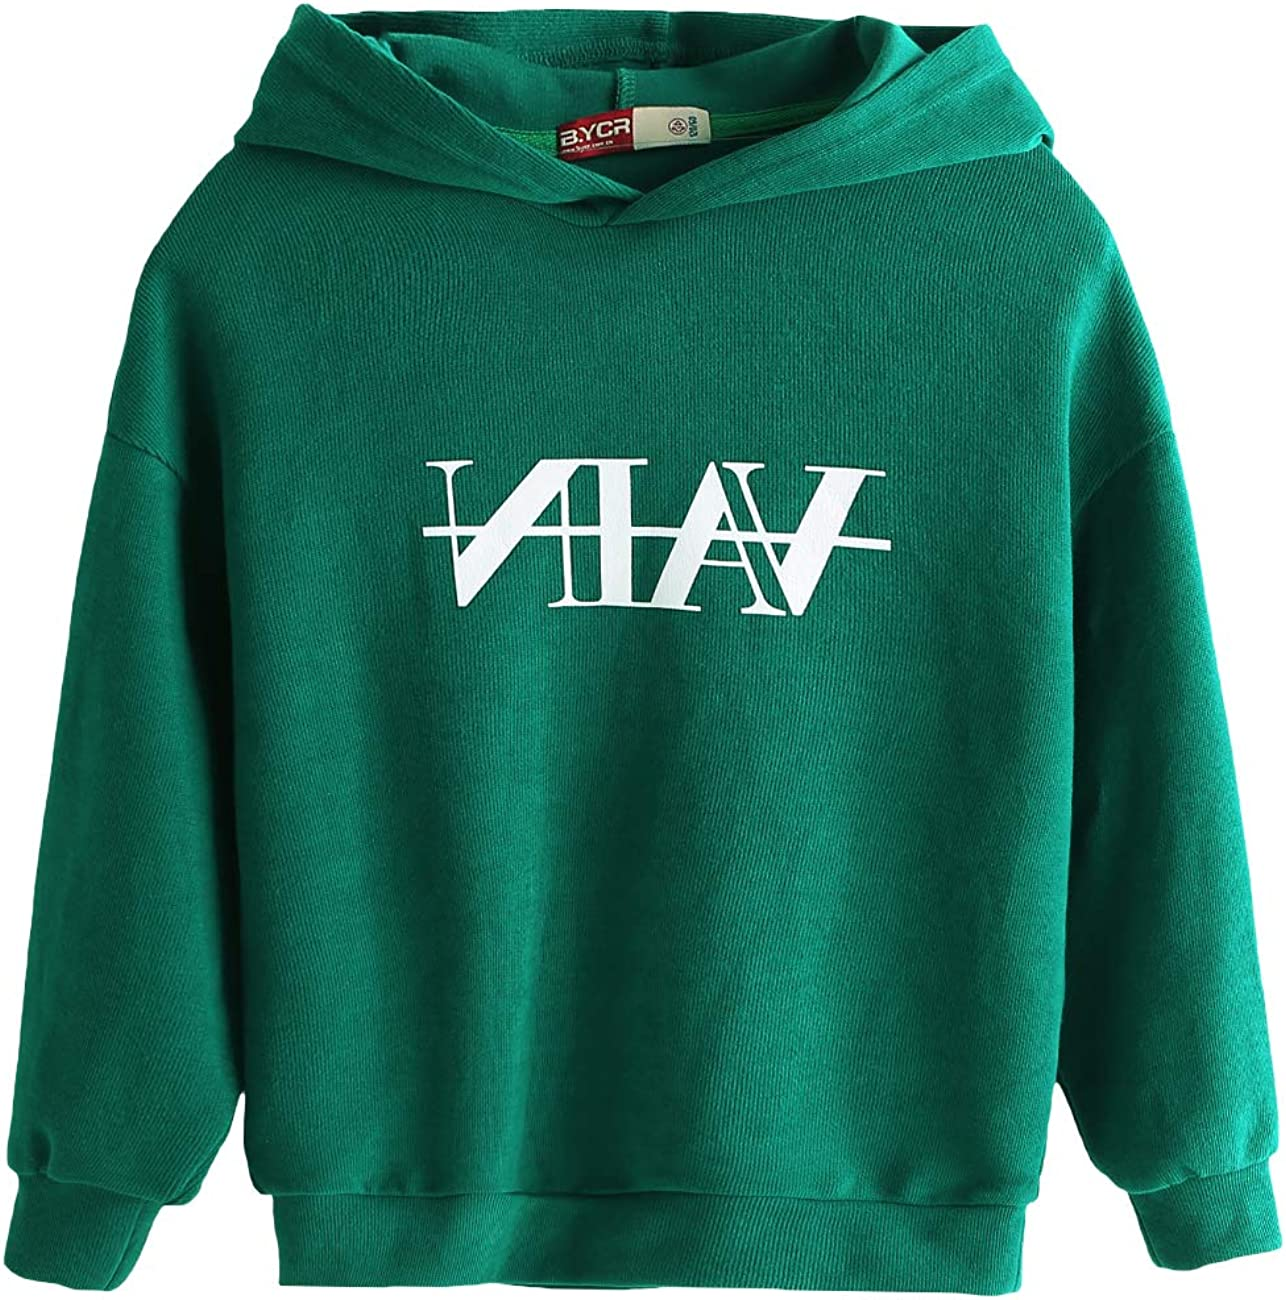 BYCR Boys' Lightweight Hoodie Soft Fleece Sweatshirt Pullover with Hood for Kids